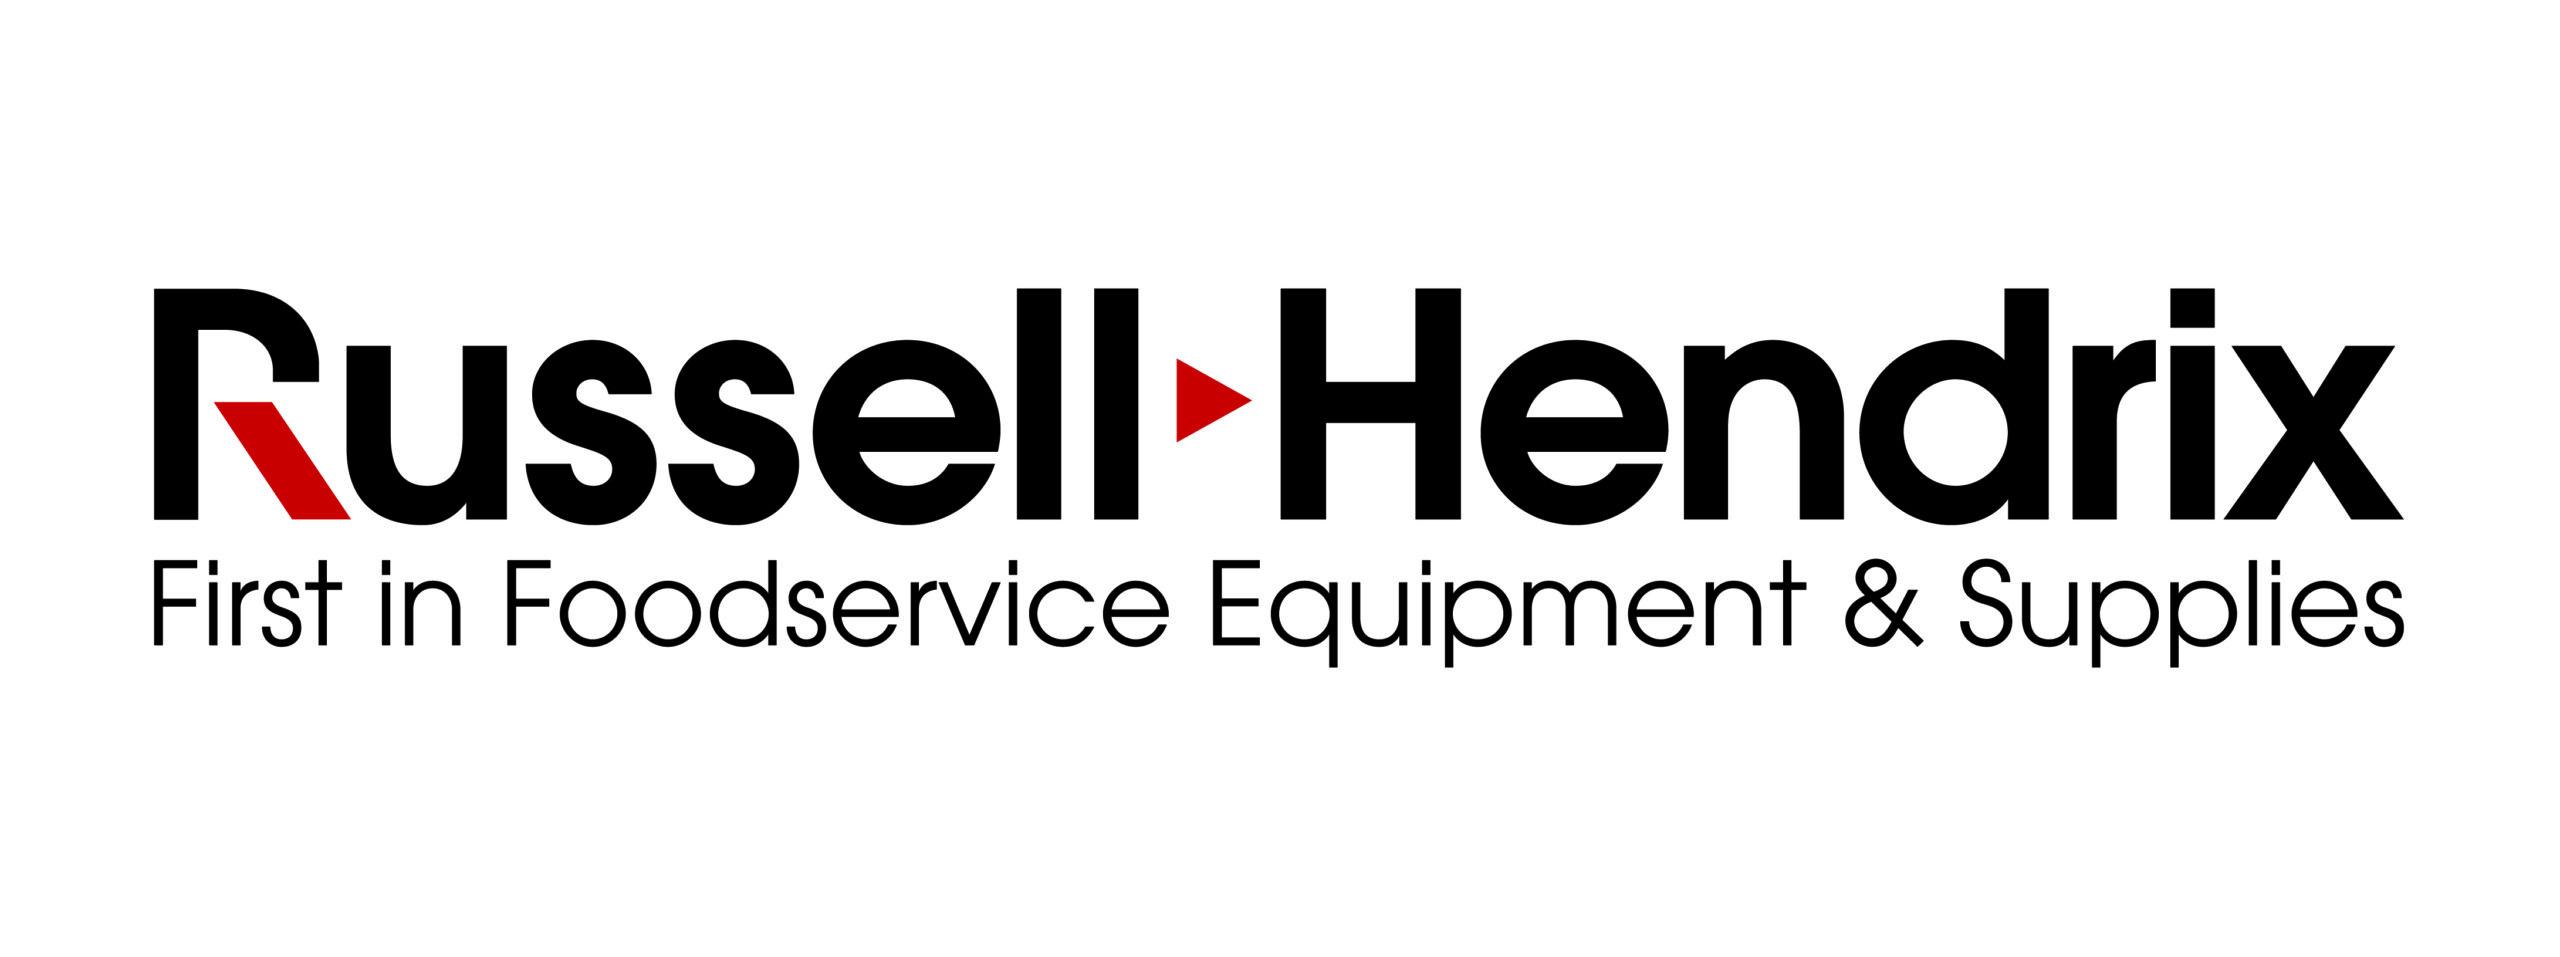 Russell Hendrix logo